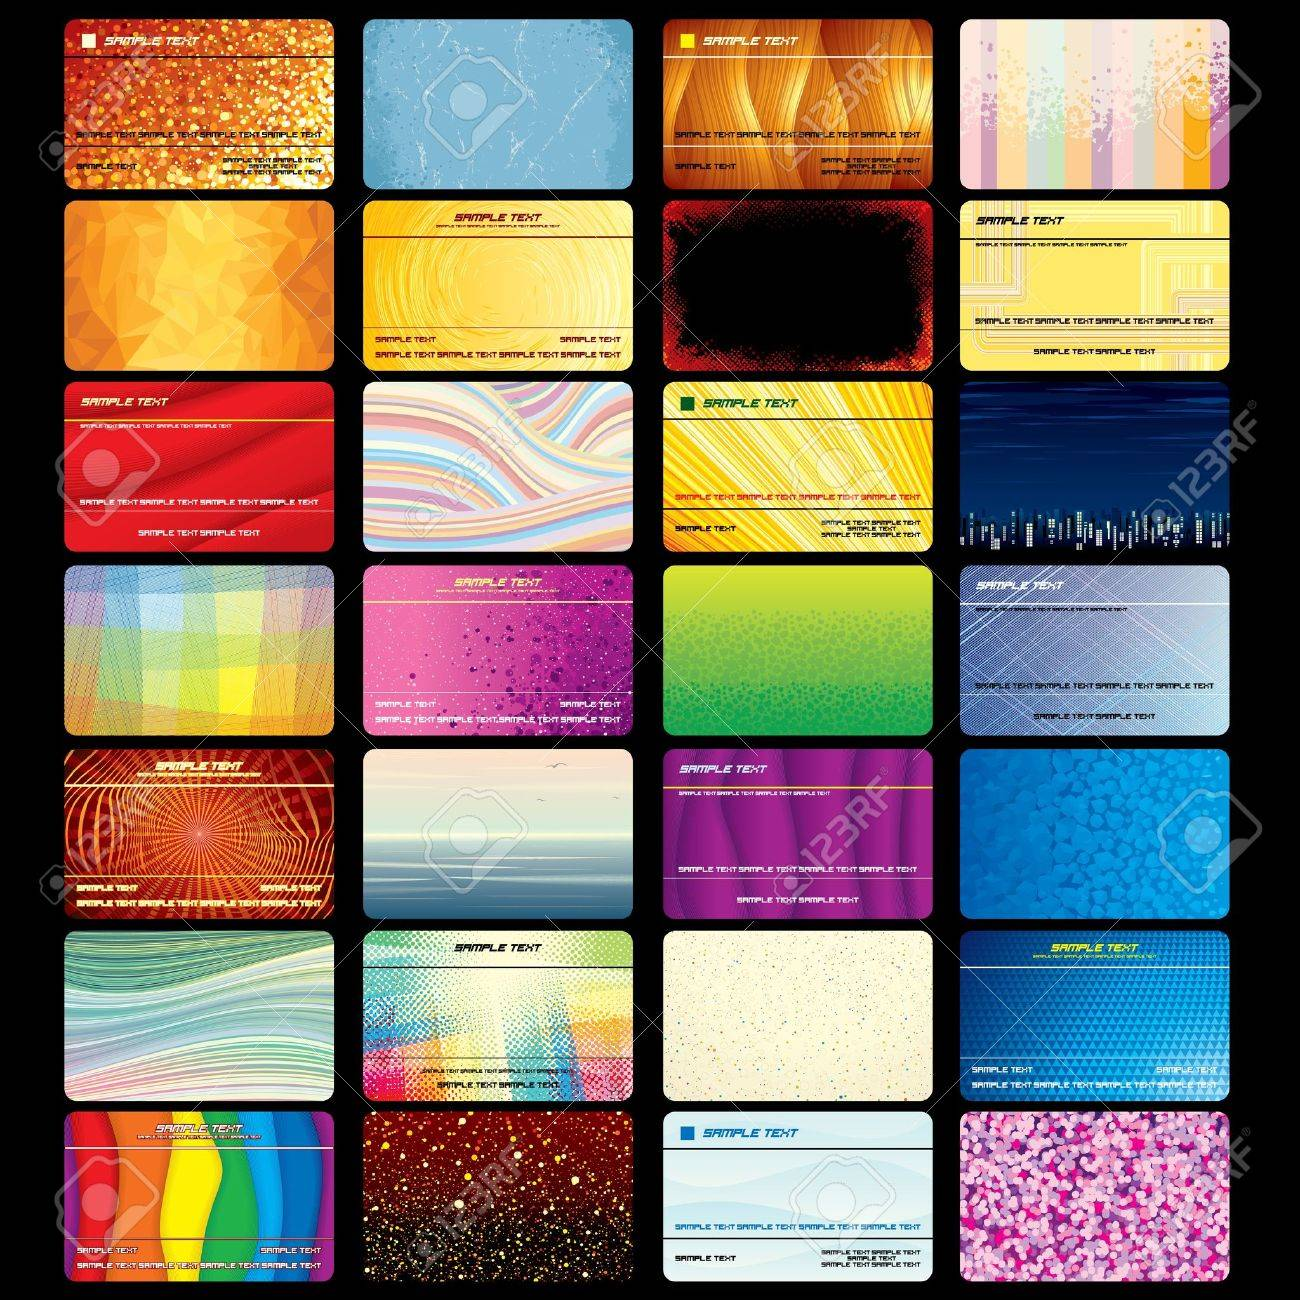 Credit card design template goseqh modern business card design template stok vektr sanat 479960280 wajeb Choice Image